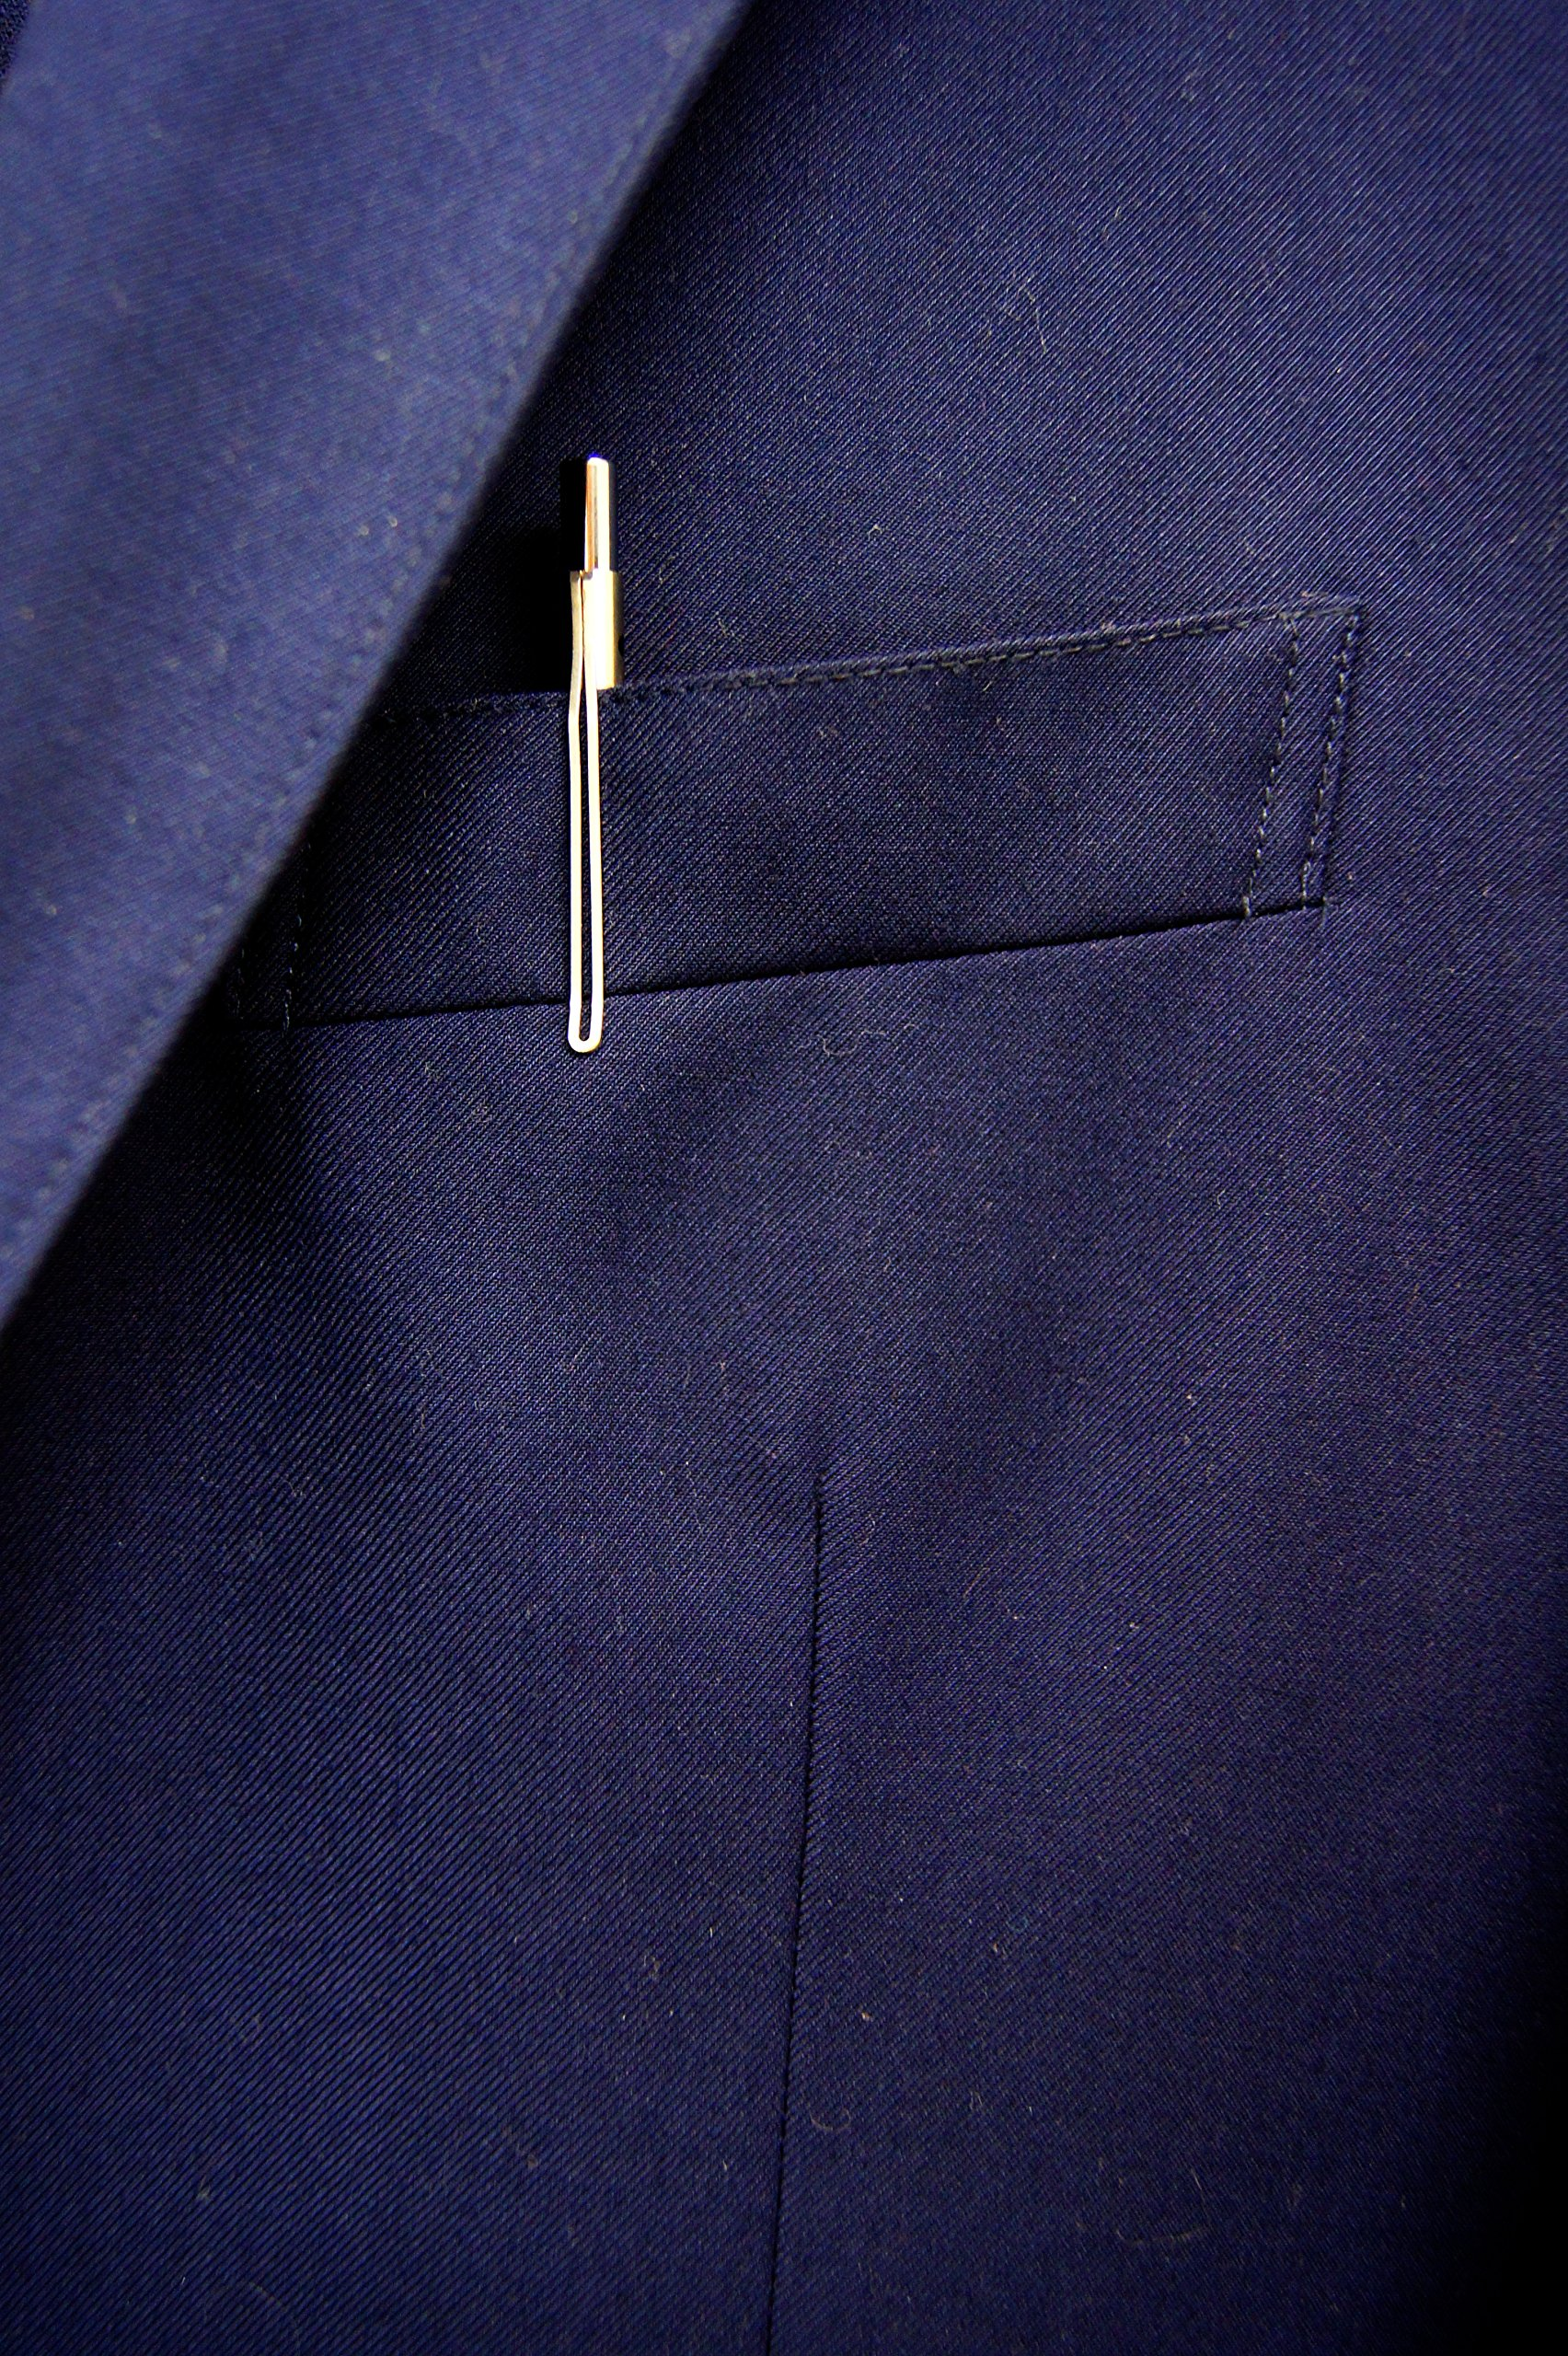 Pilot Birdy Switch Multi Pen, Ballpoint Pen 0.7mm Black Ink + Mechanical Pencil 0.5 mm, 3-pack, Sticky Notes Value Set by Stationery JP (Image #1)